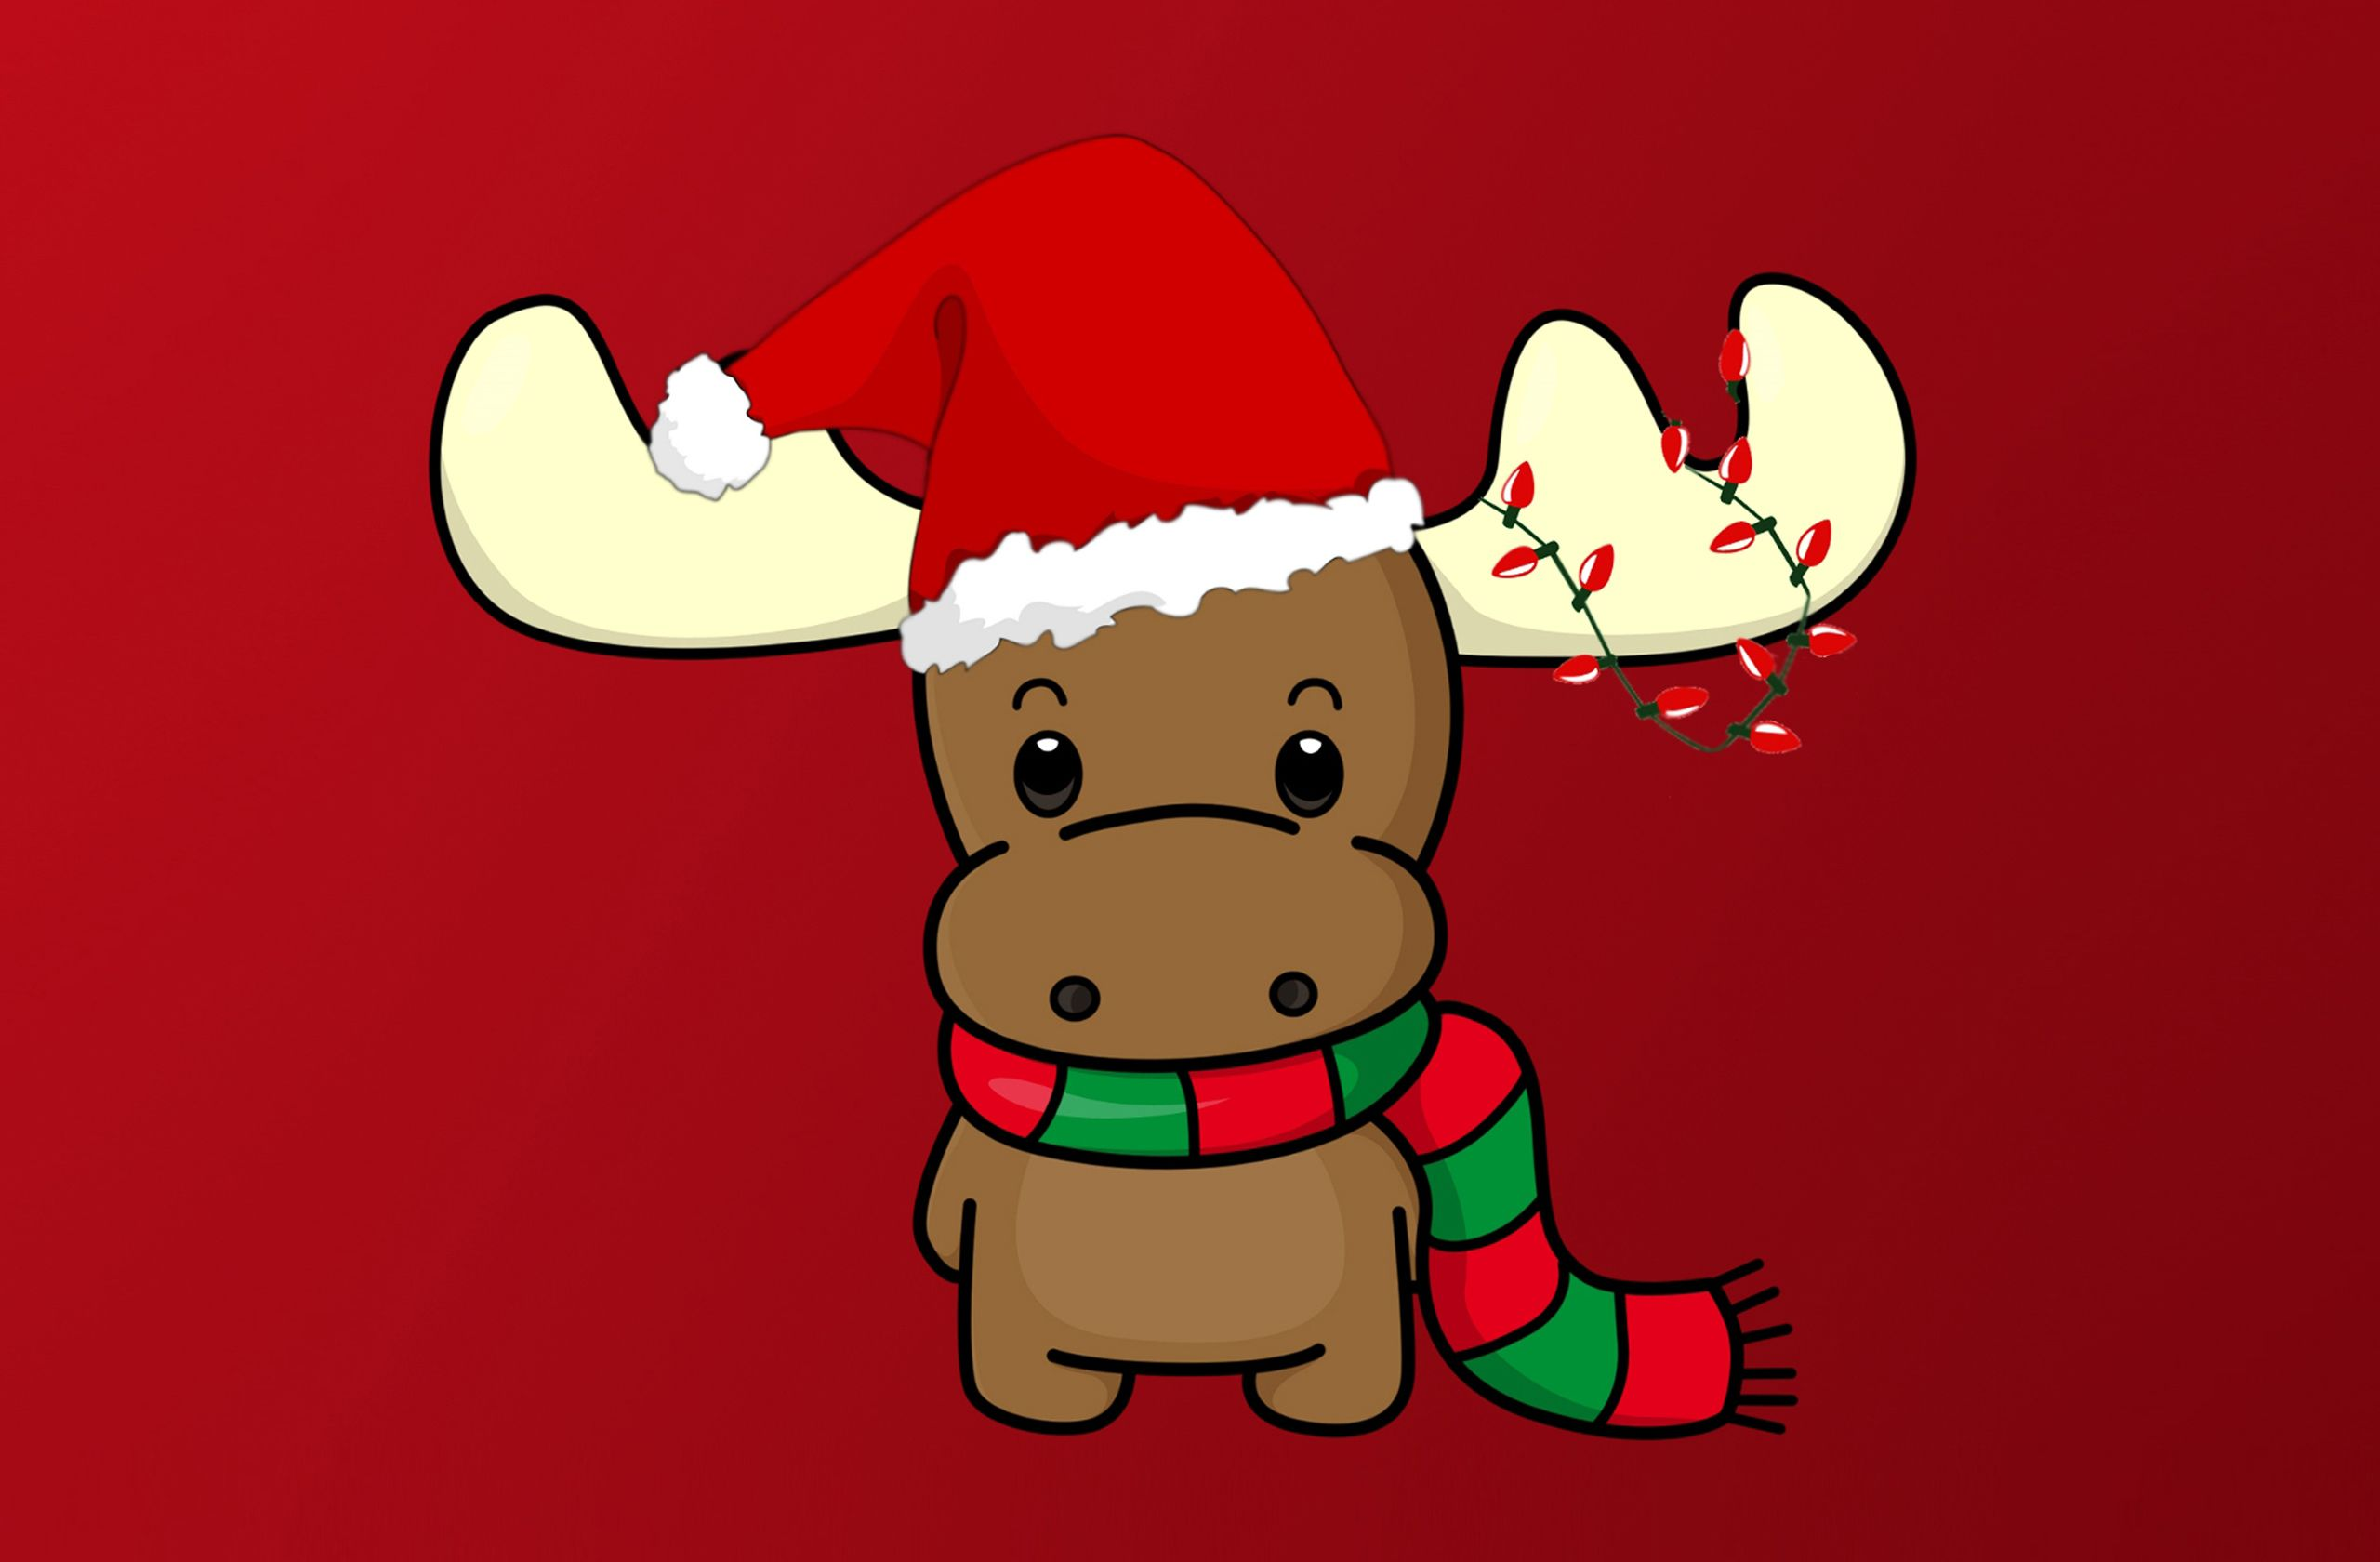 Cute Cartoon Christmas Wallpapers - Top